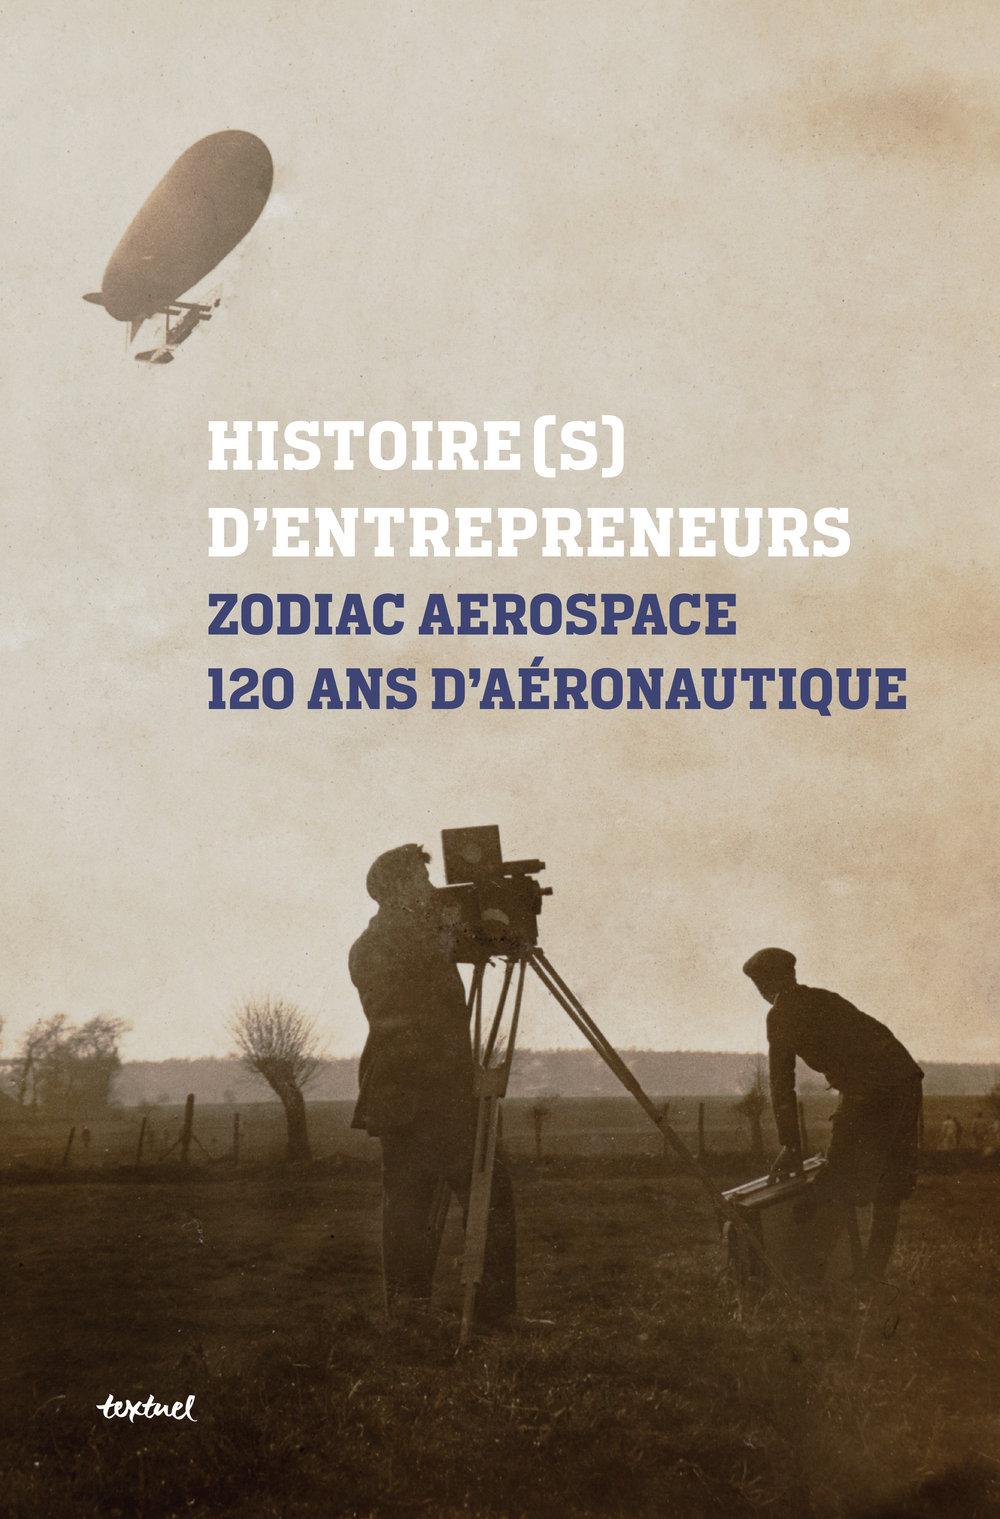 Zodiac AerospaceHistoire(s) d'entrepreneurs - Corporate Book Design for French Company Zodiac Aerospace.Awarded